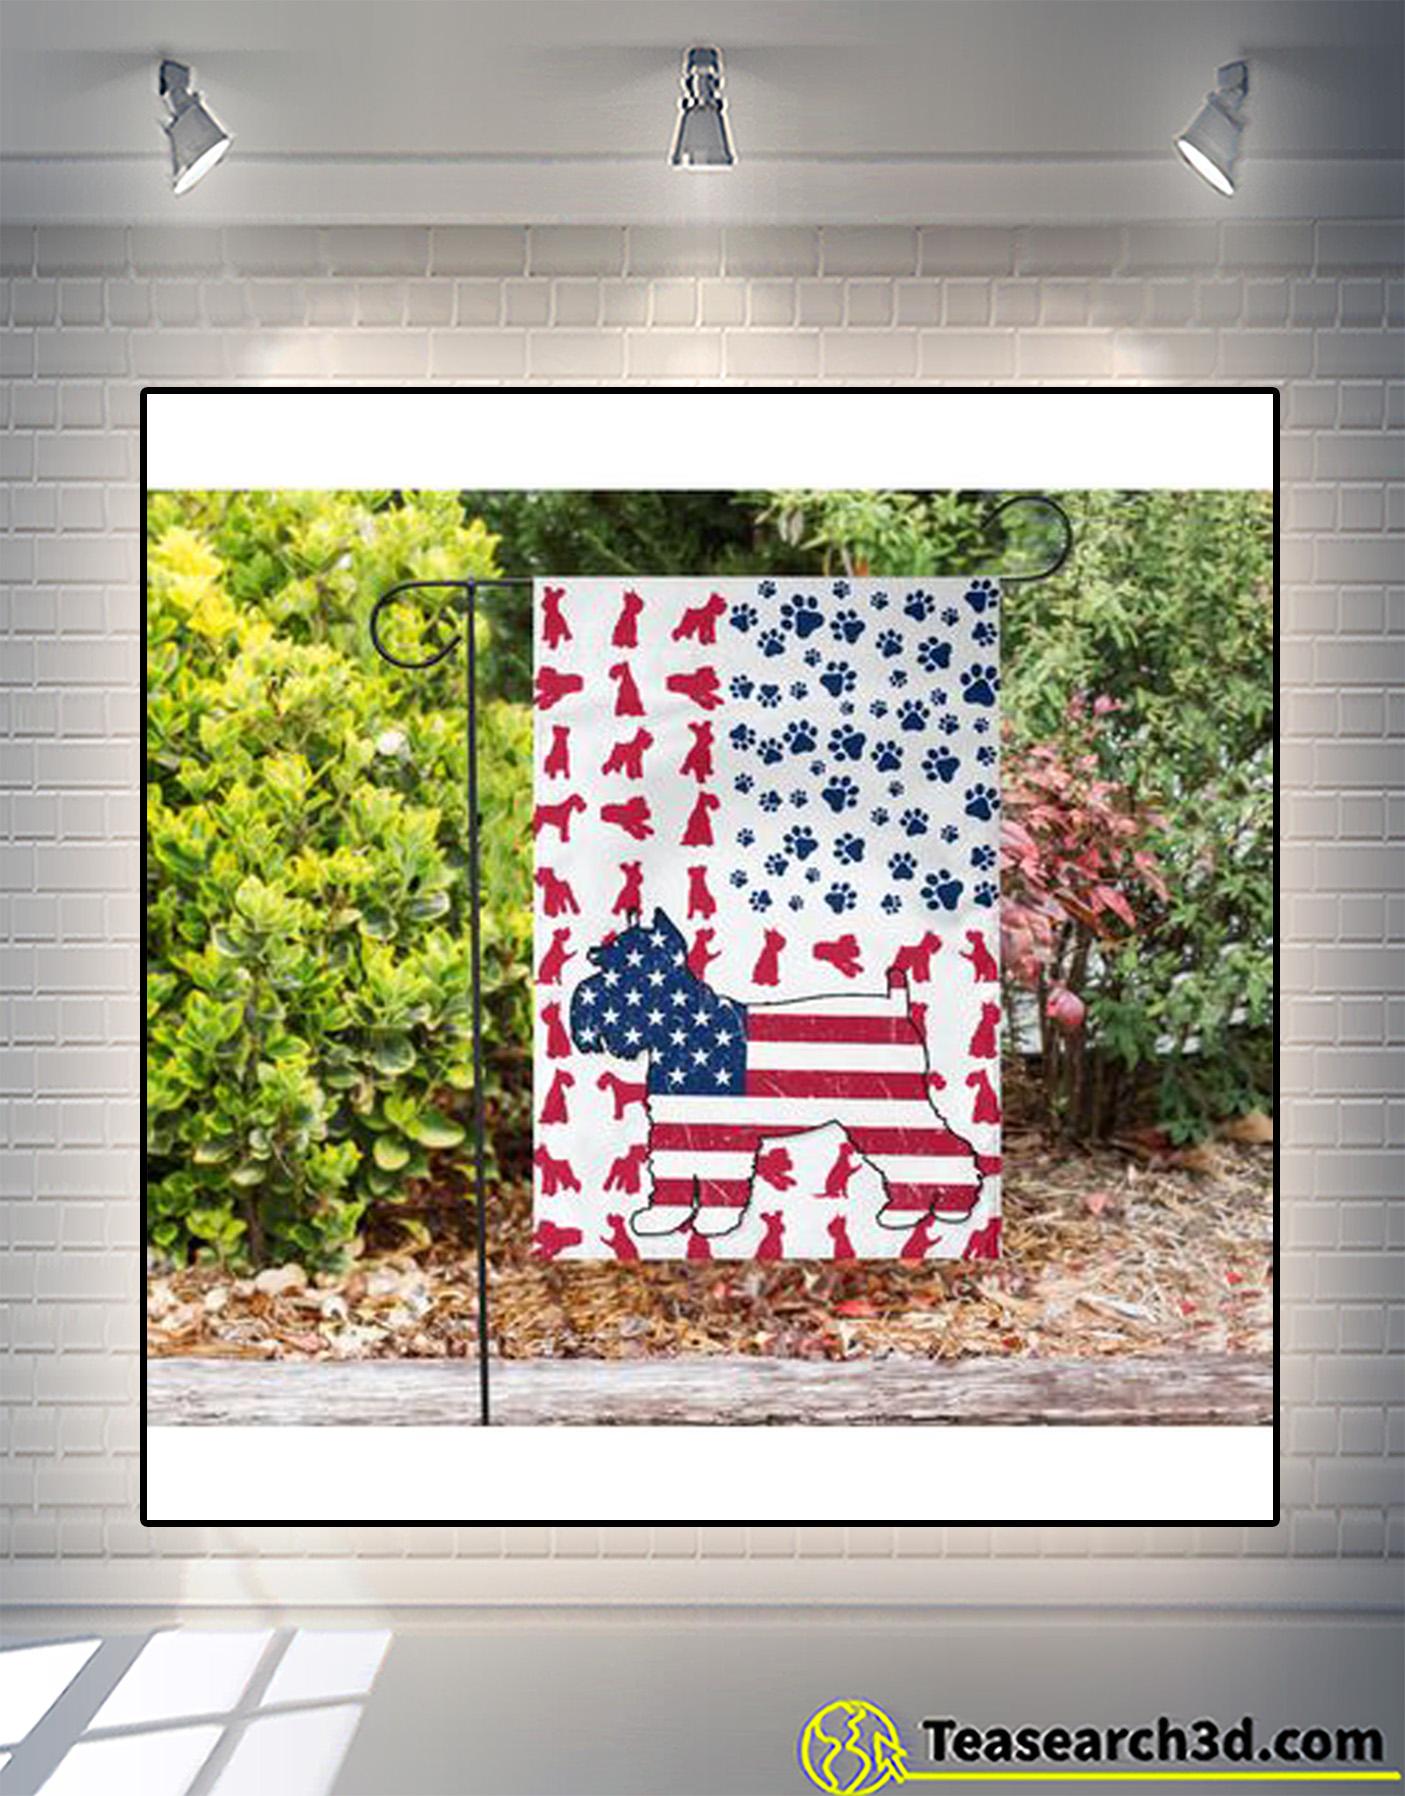 Schnauzer american flag garden-house flag 3